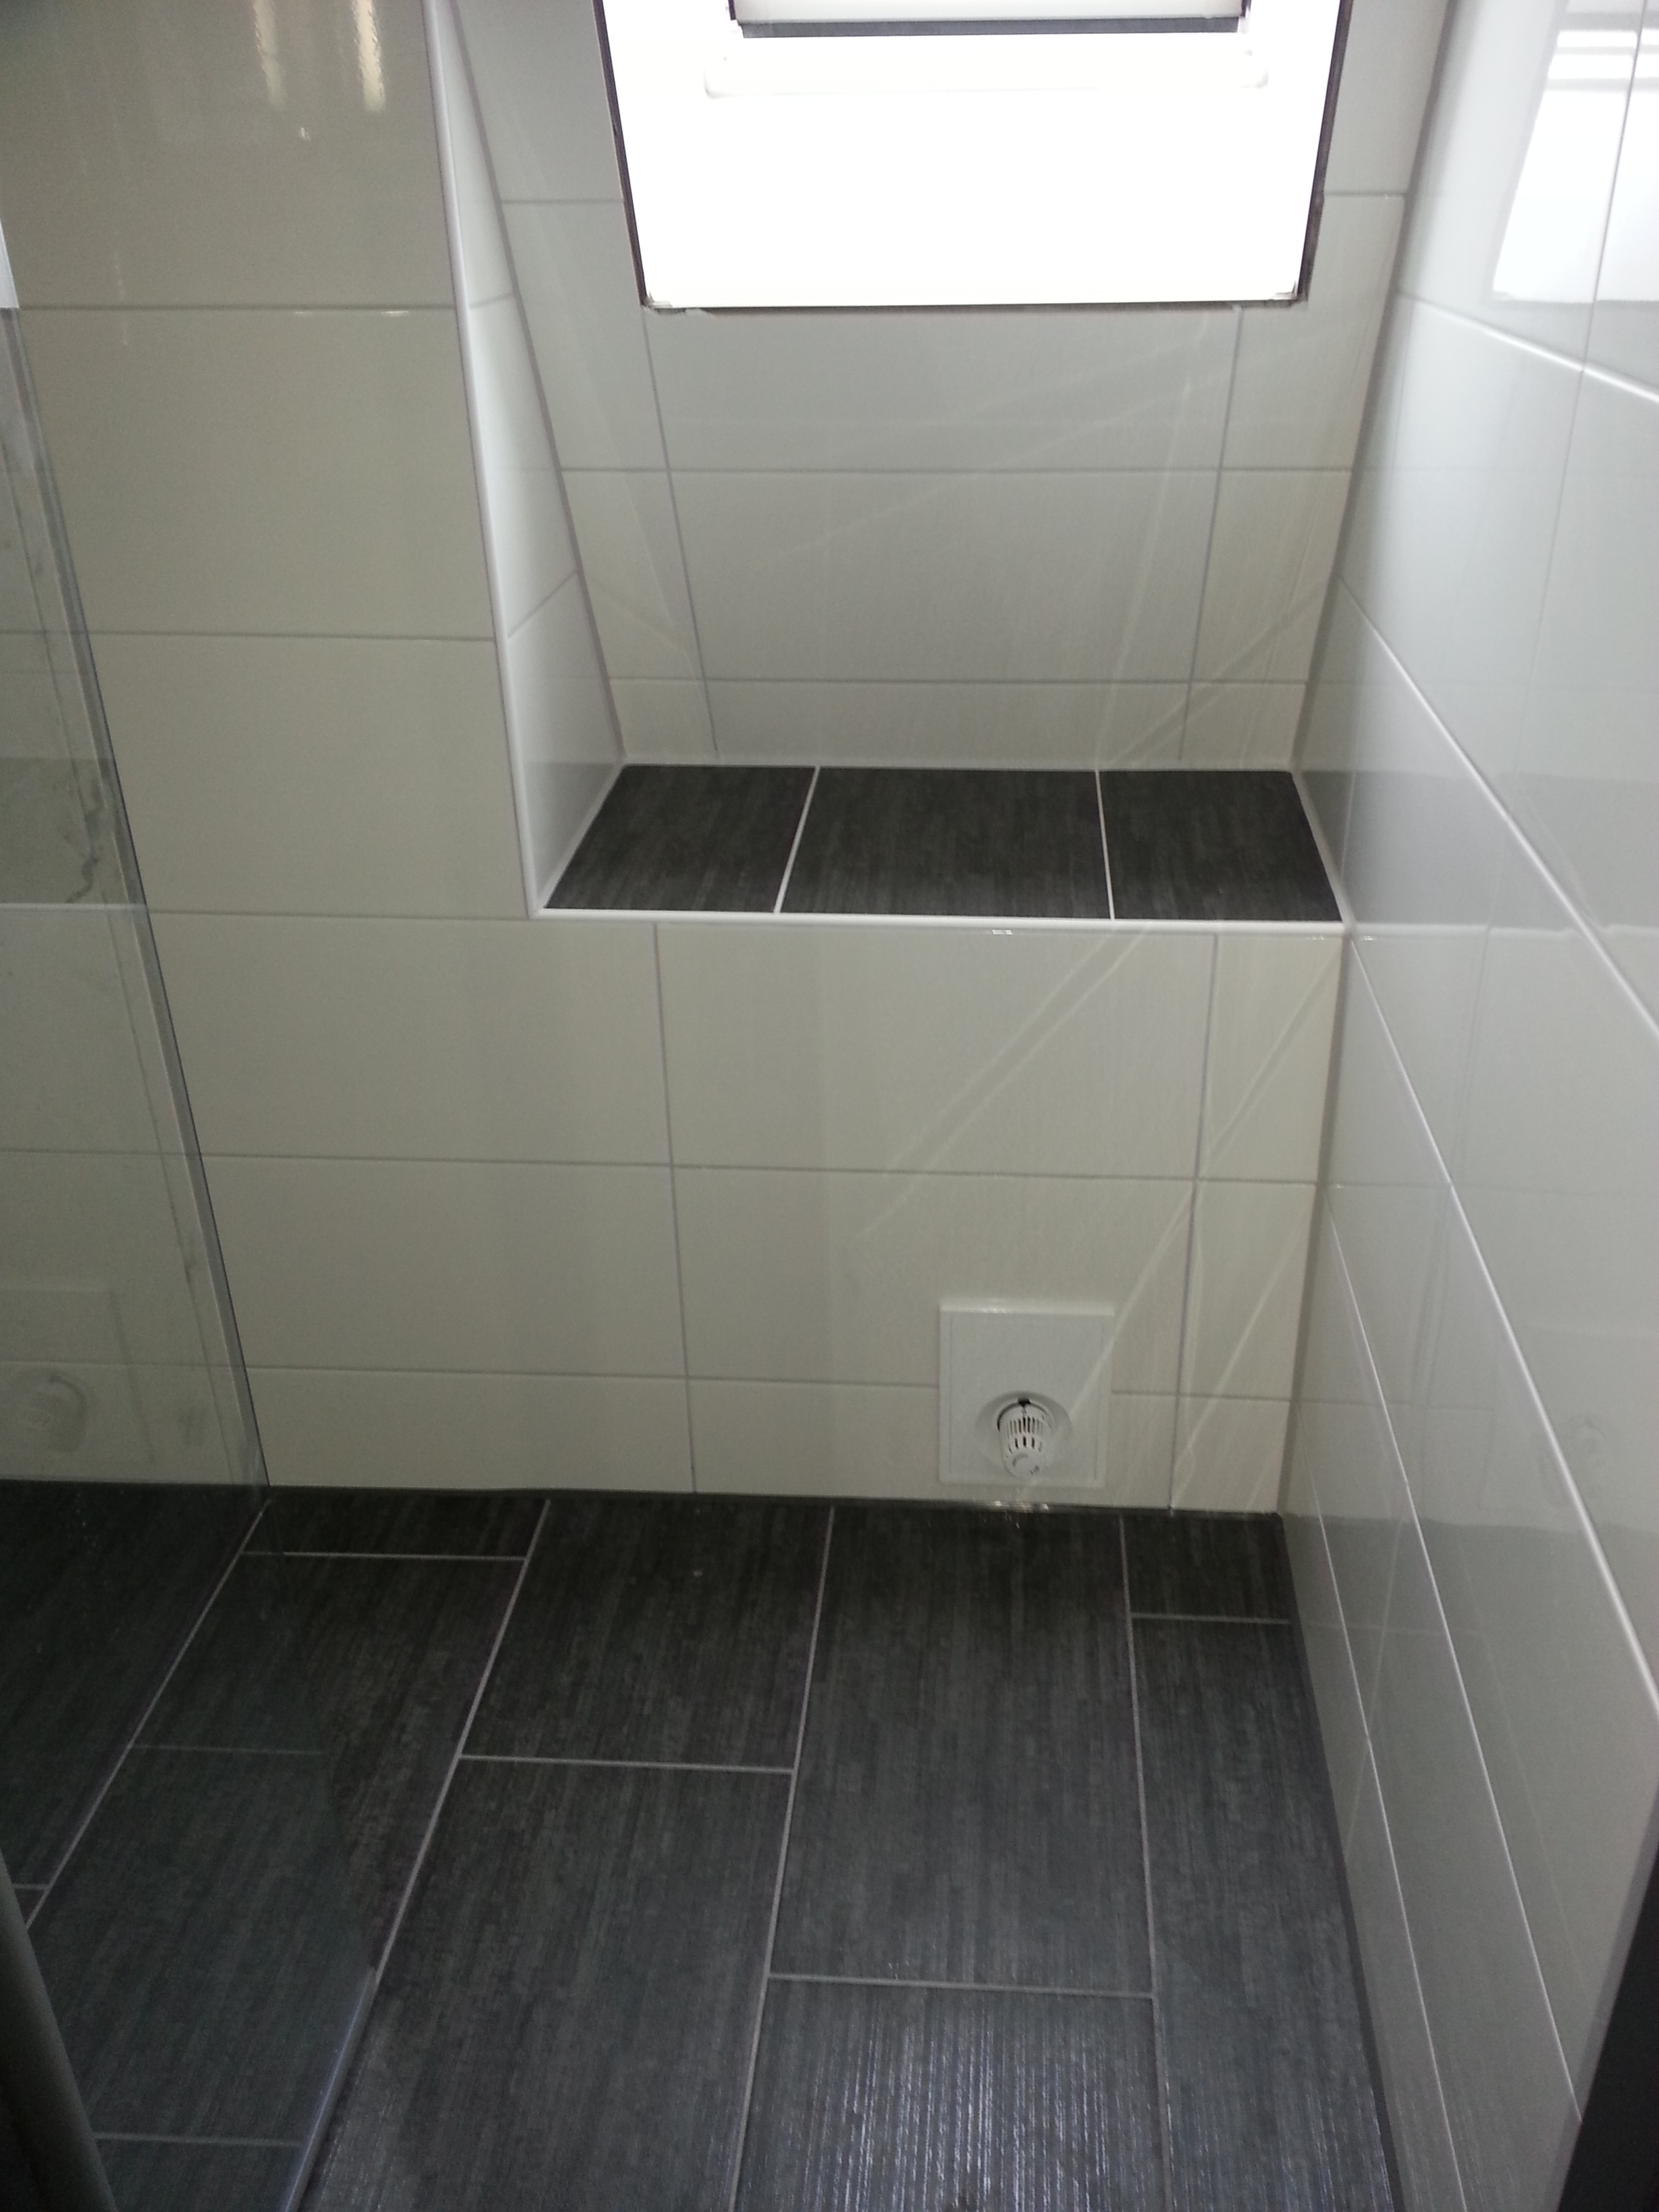 bodenbelag f r badezimmer hausgestaltung ideen. Black Bedroom Furniture Sets. Home Design Ideas